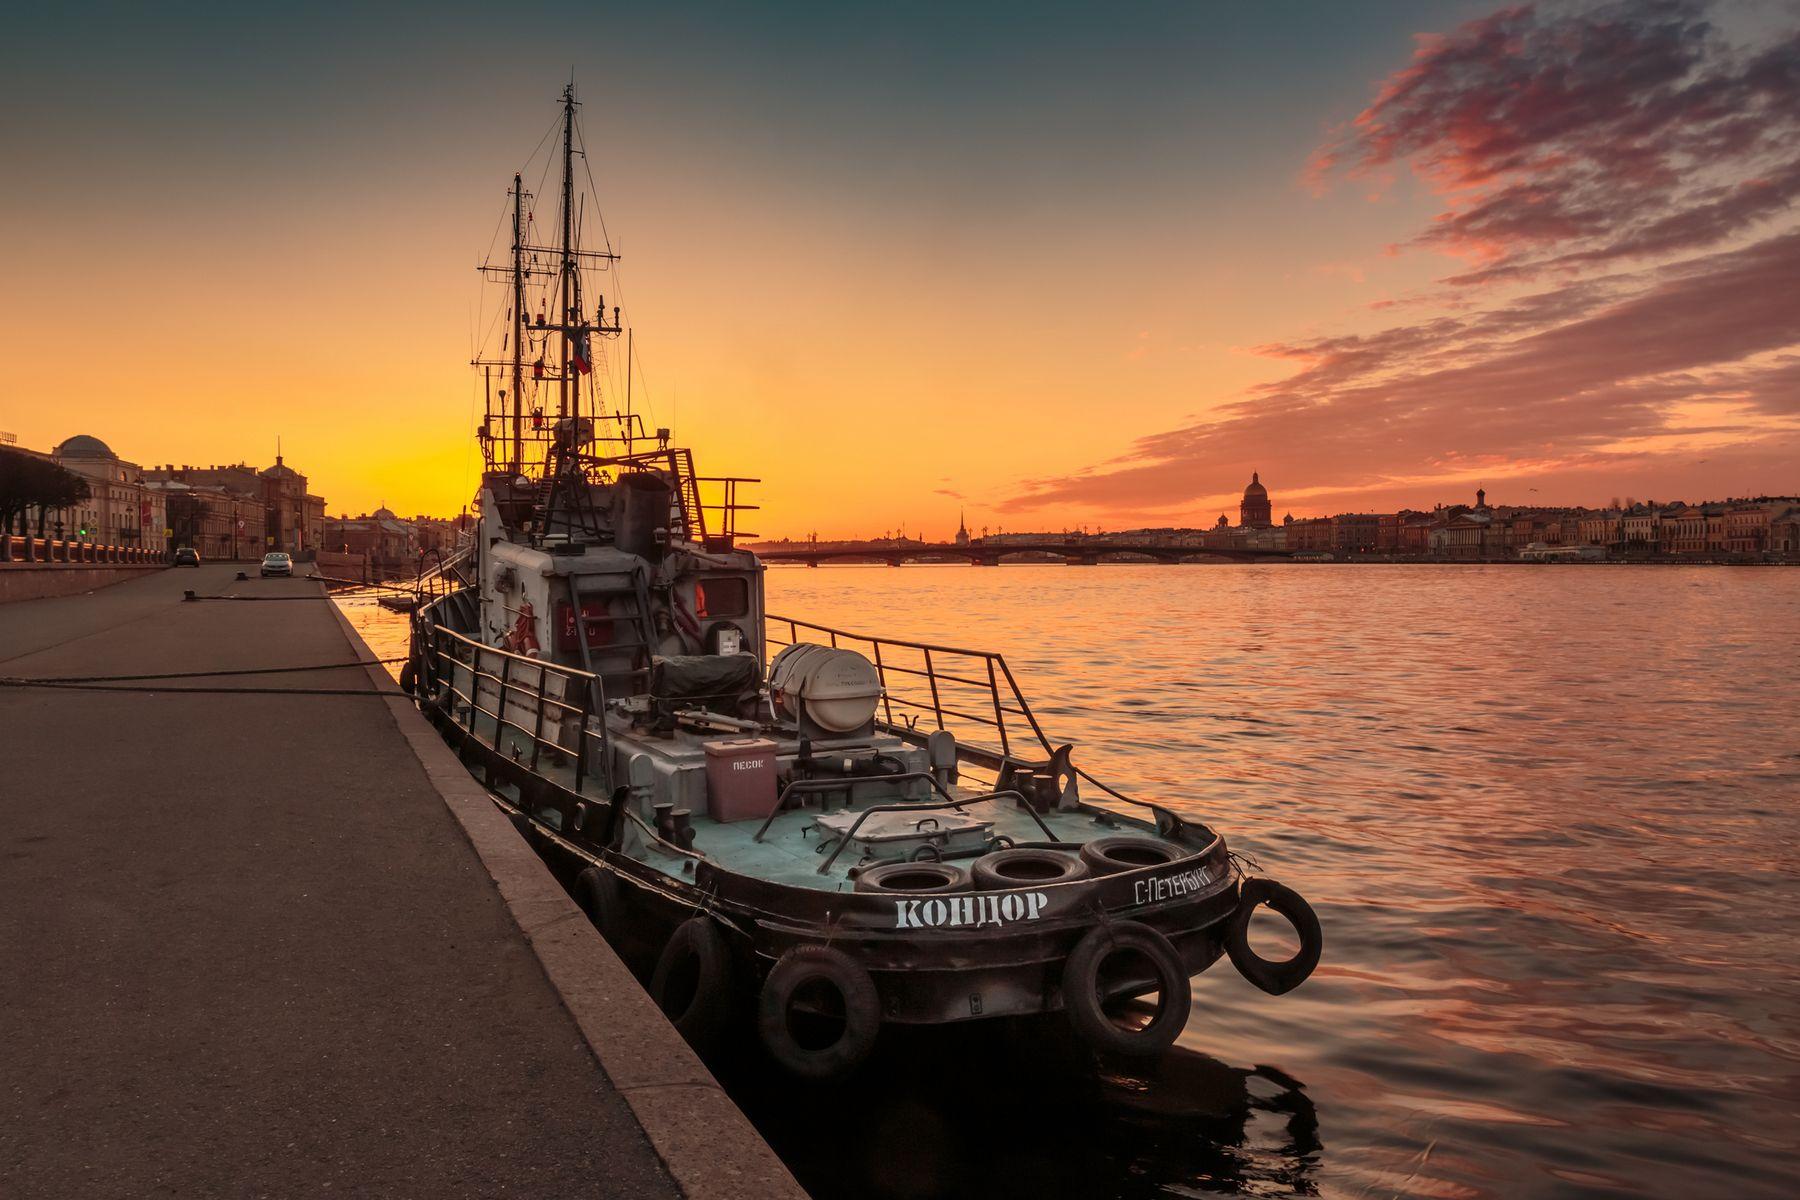 Один день кондора Санкт-Петербург утро раннее река отражение Нева восход буксир